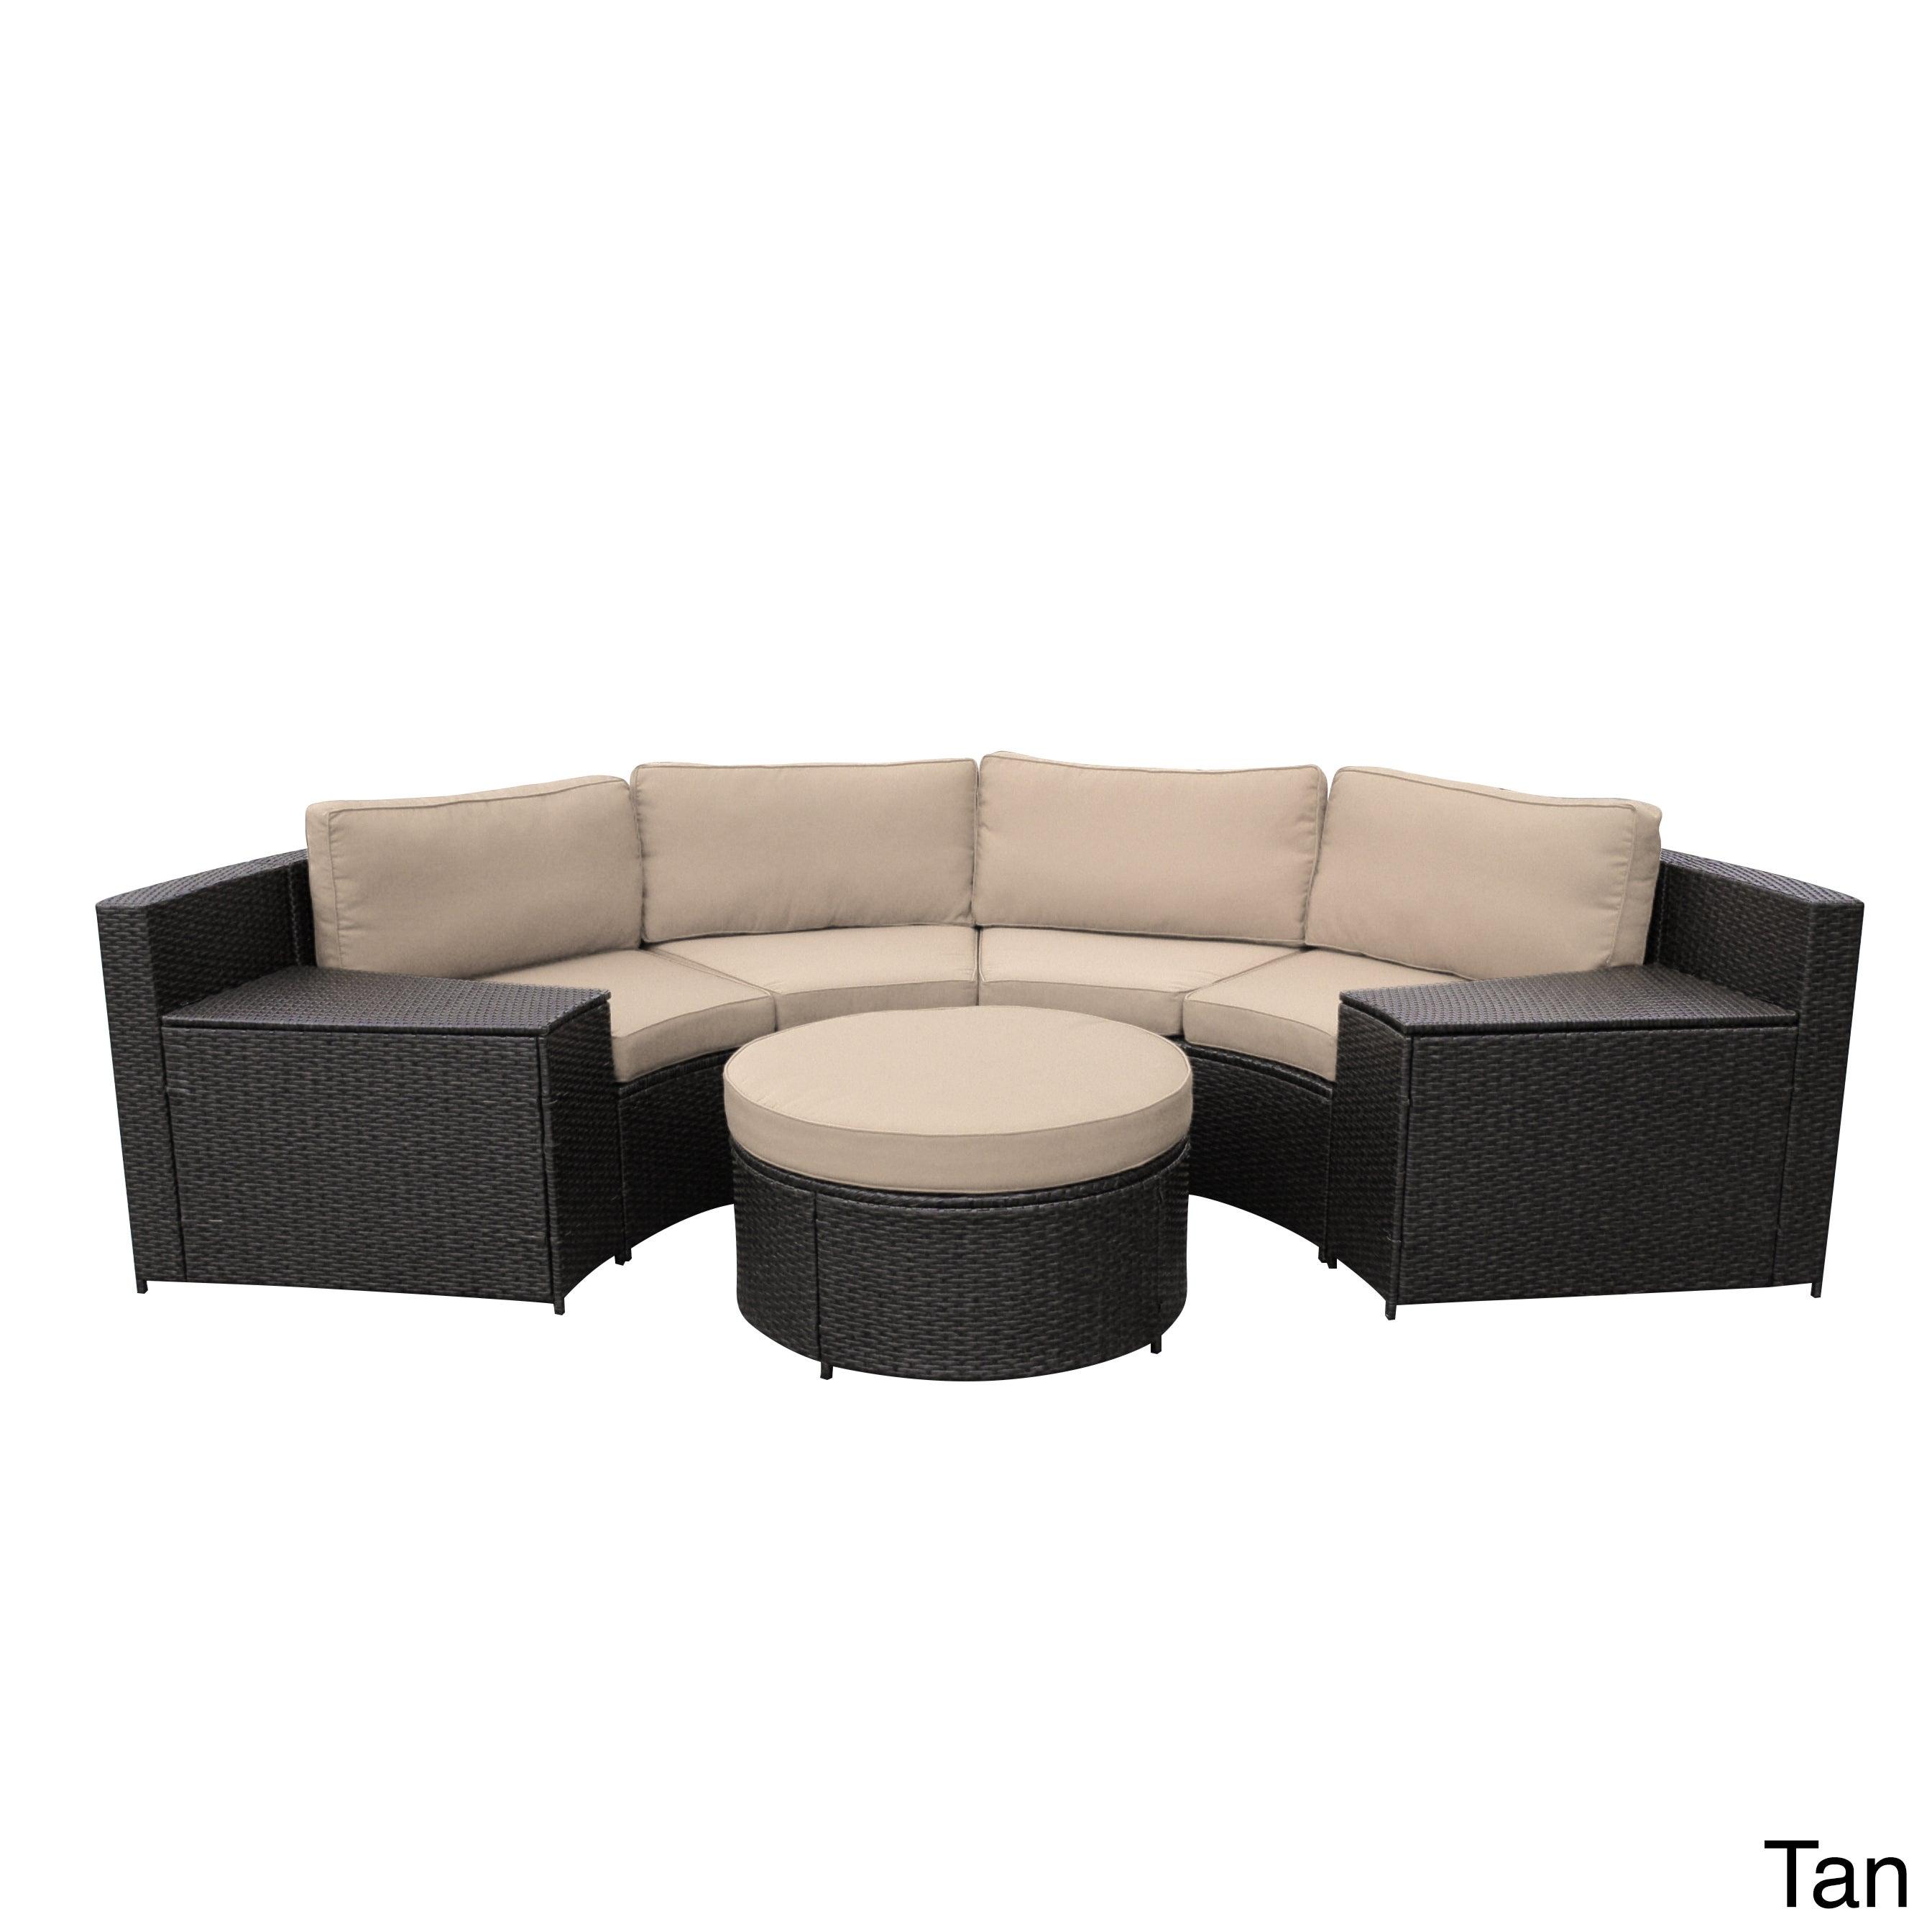 Curved Rattan Garden Sofa: Cartagena W00502 Wicker Curved Modular Sofa With Cushions